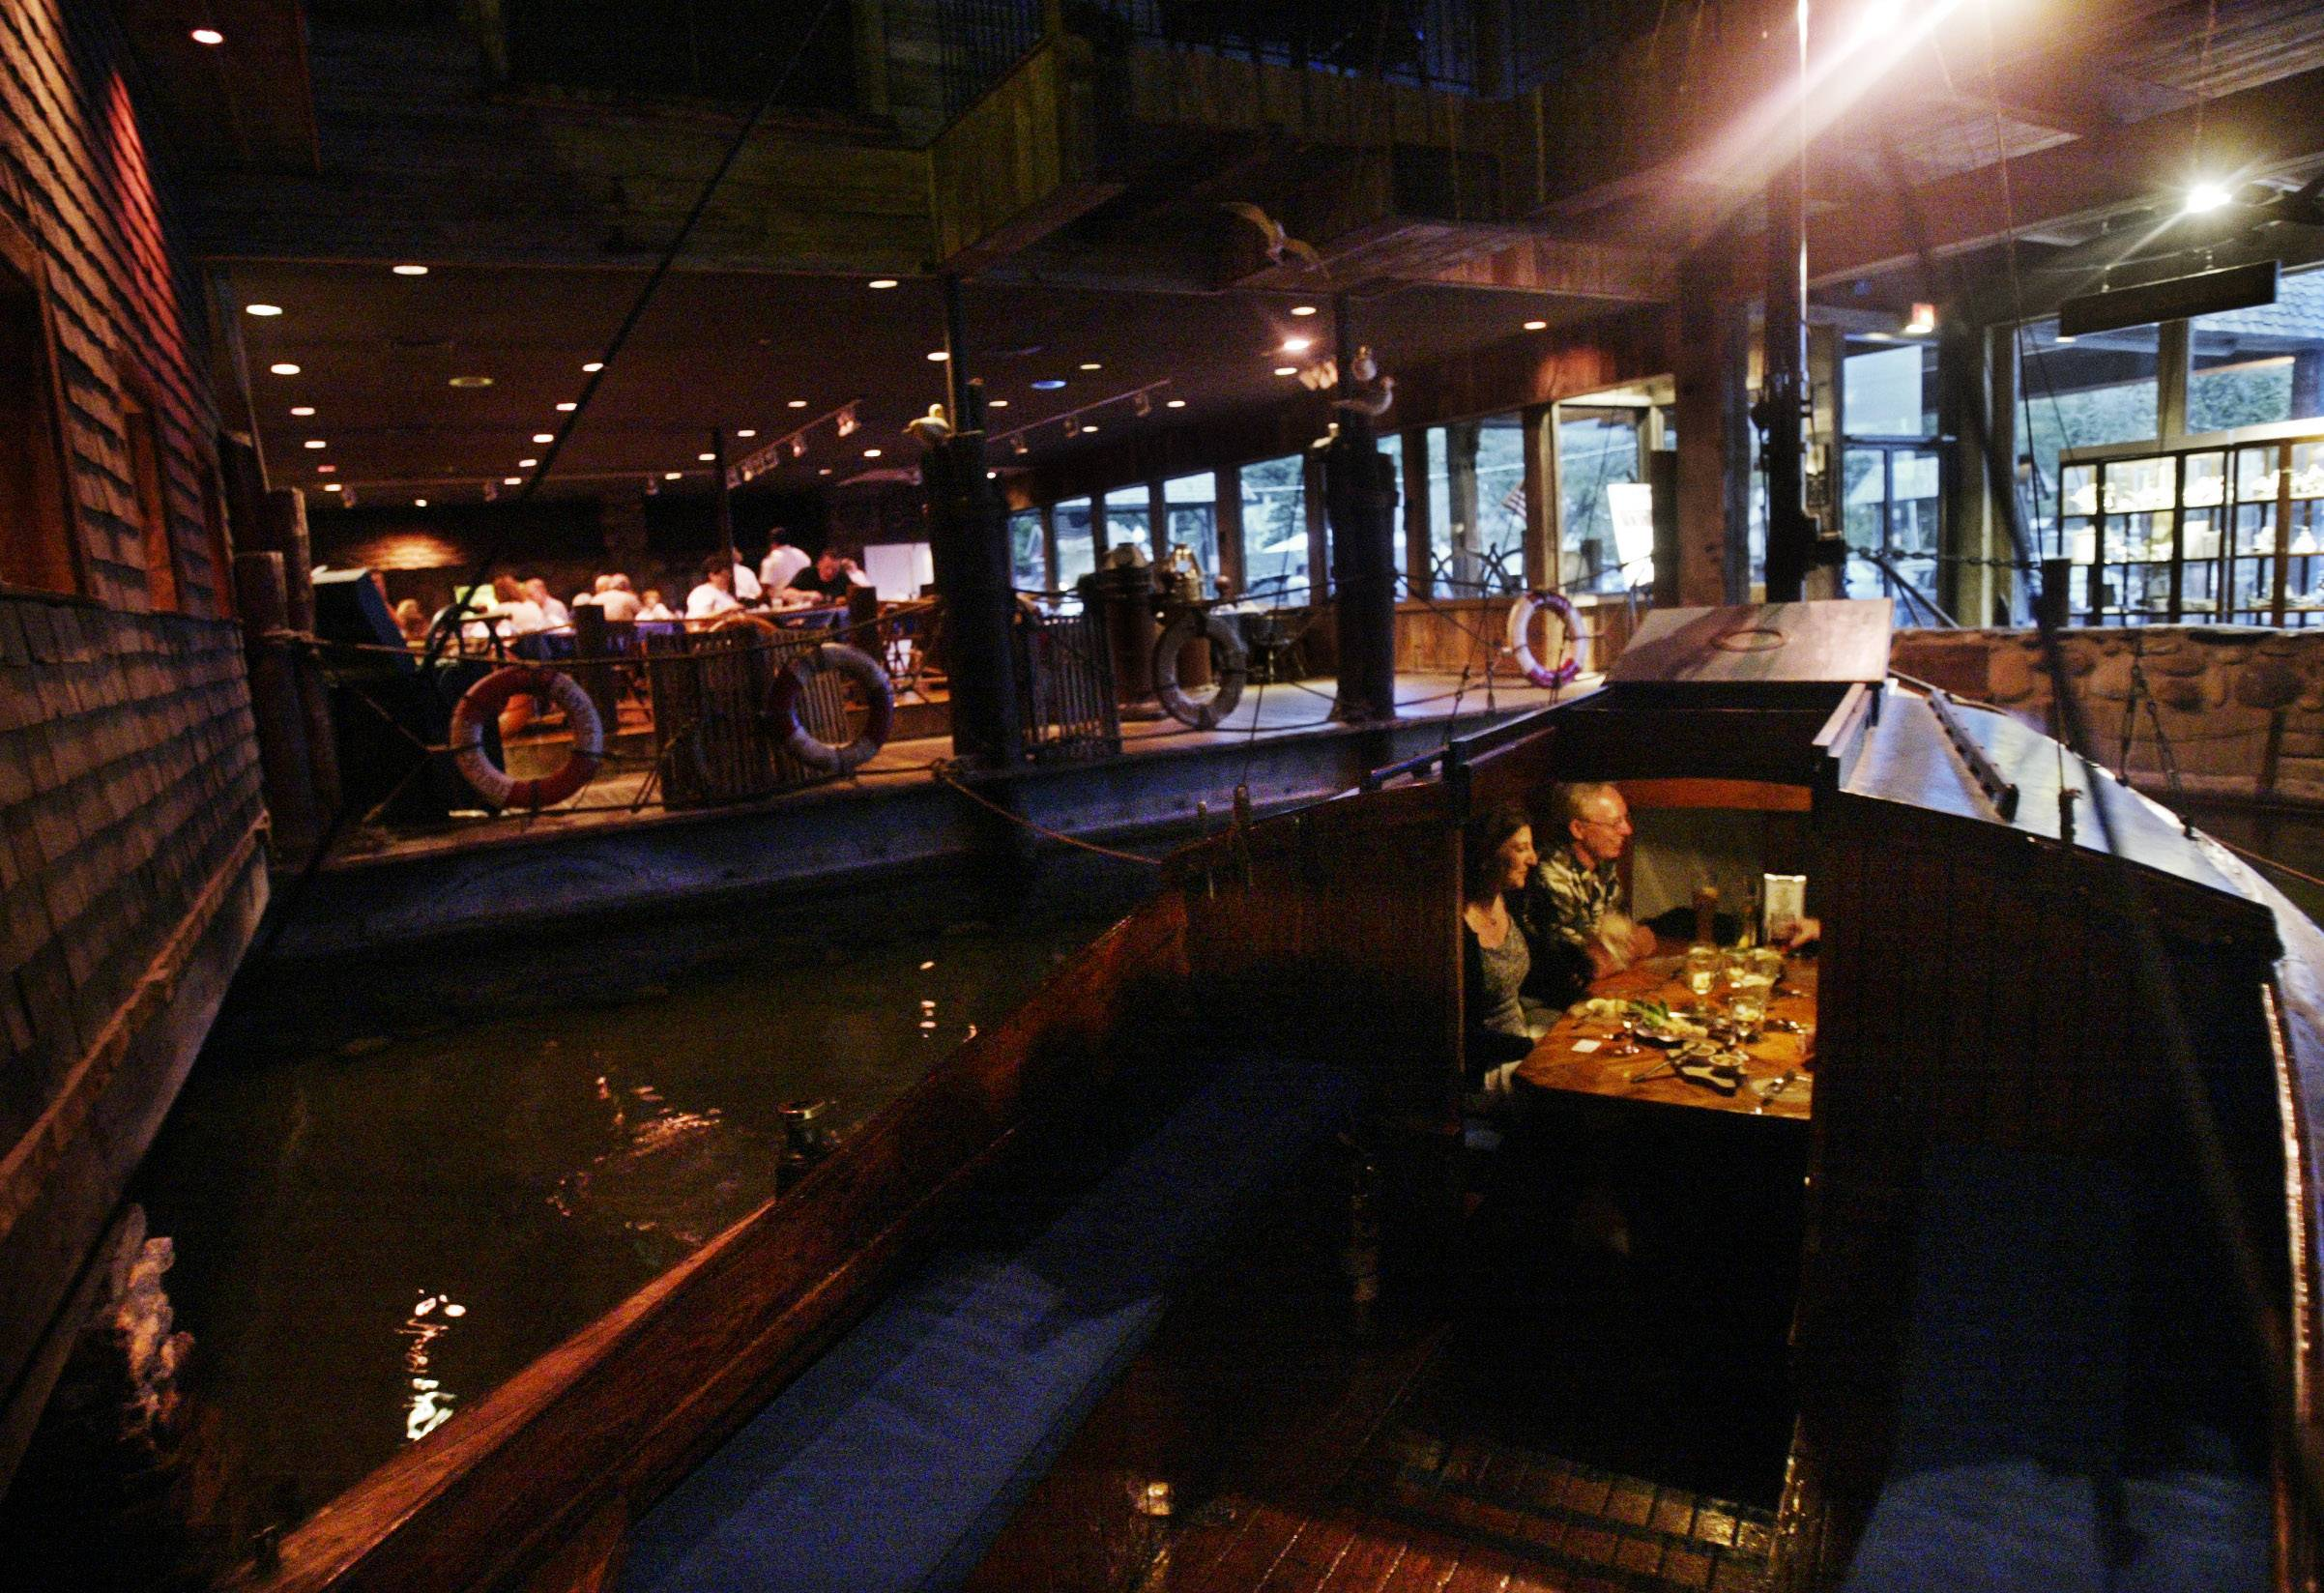 Best Restaurants Near Algonquin Il | Best Restaurants Near Me